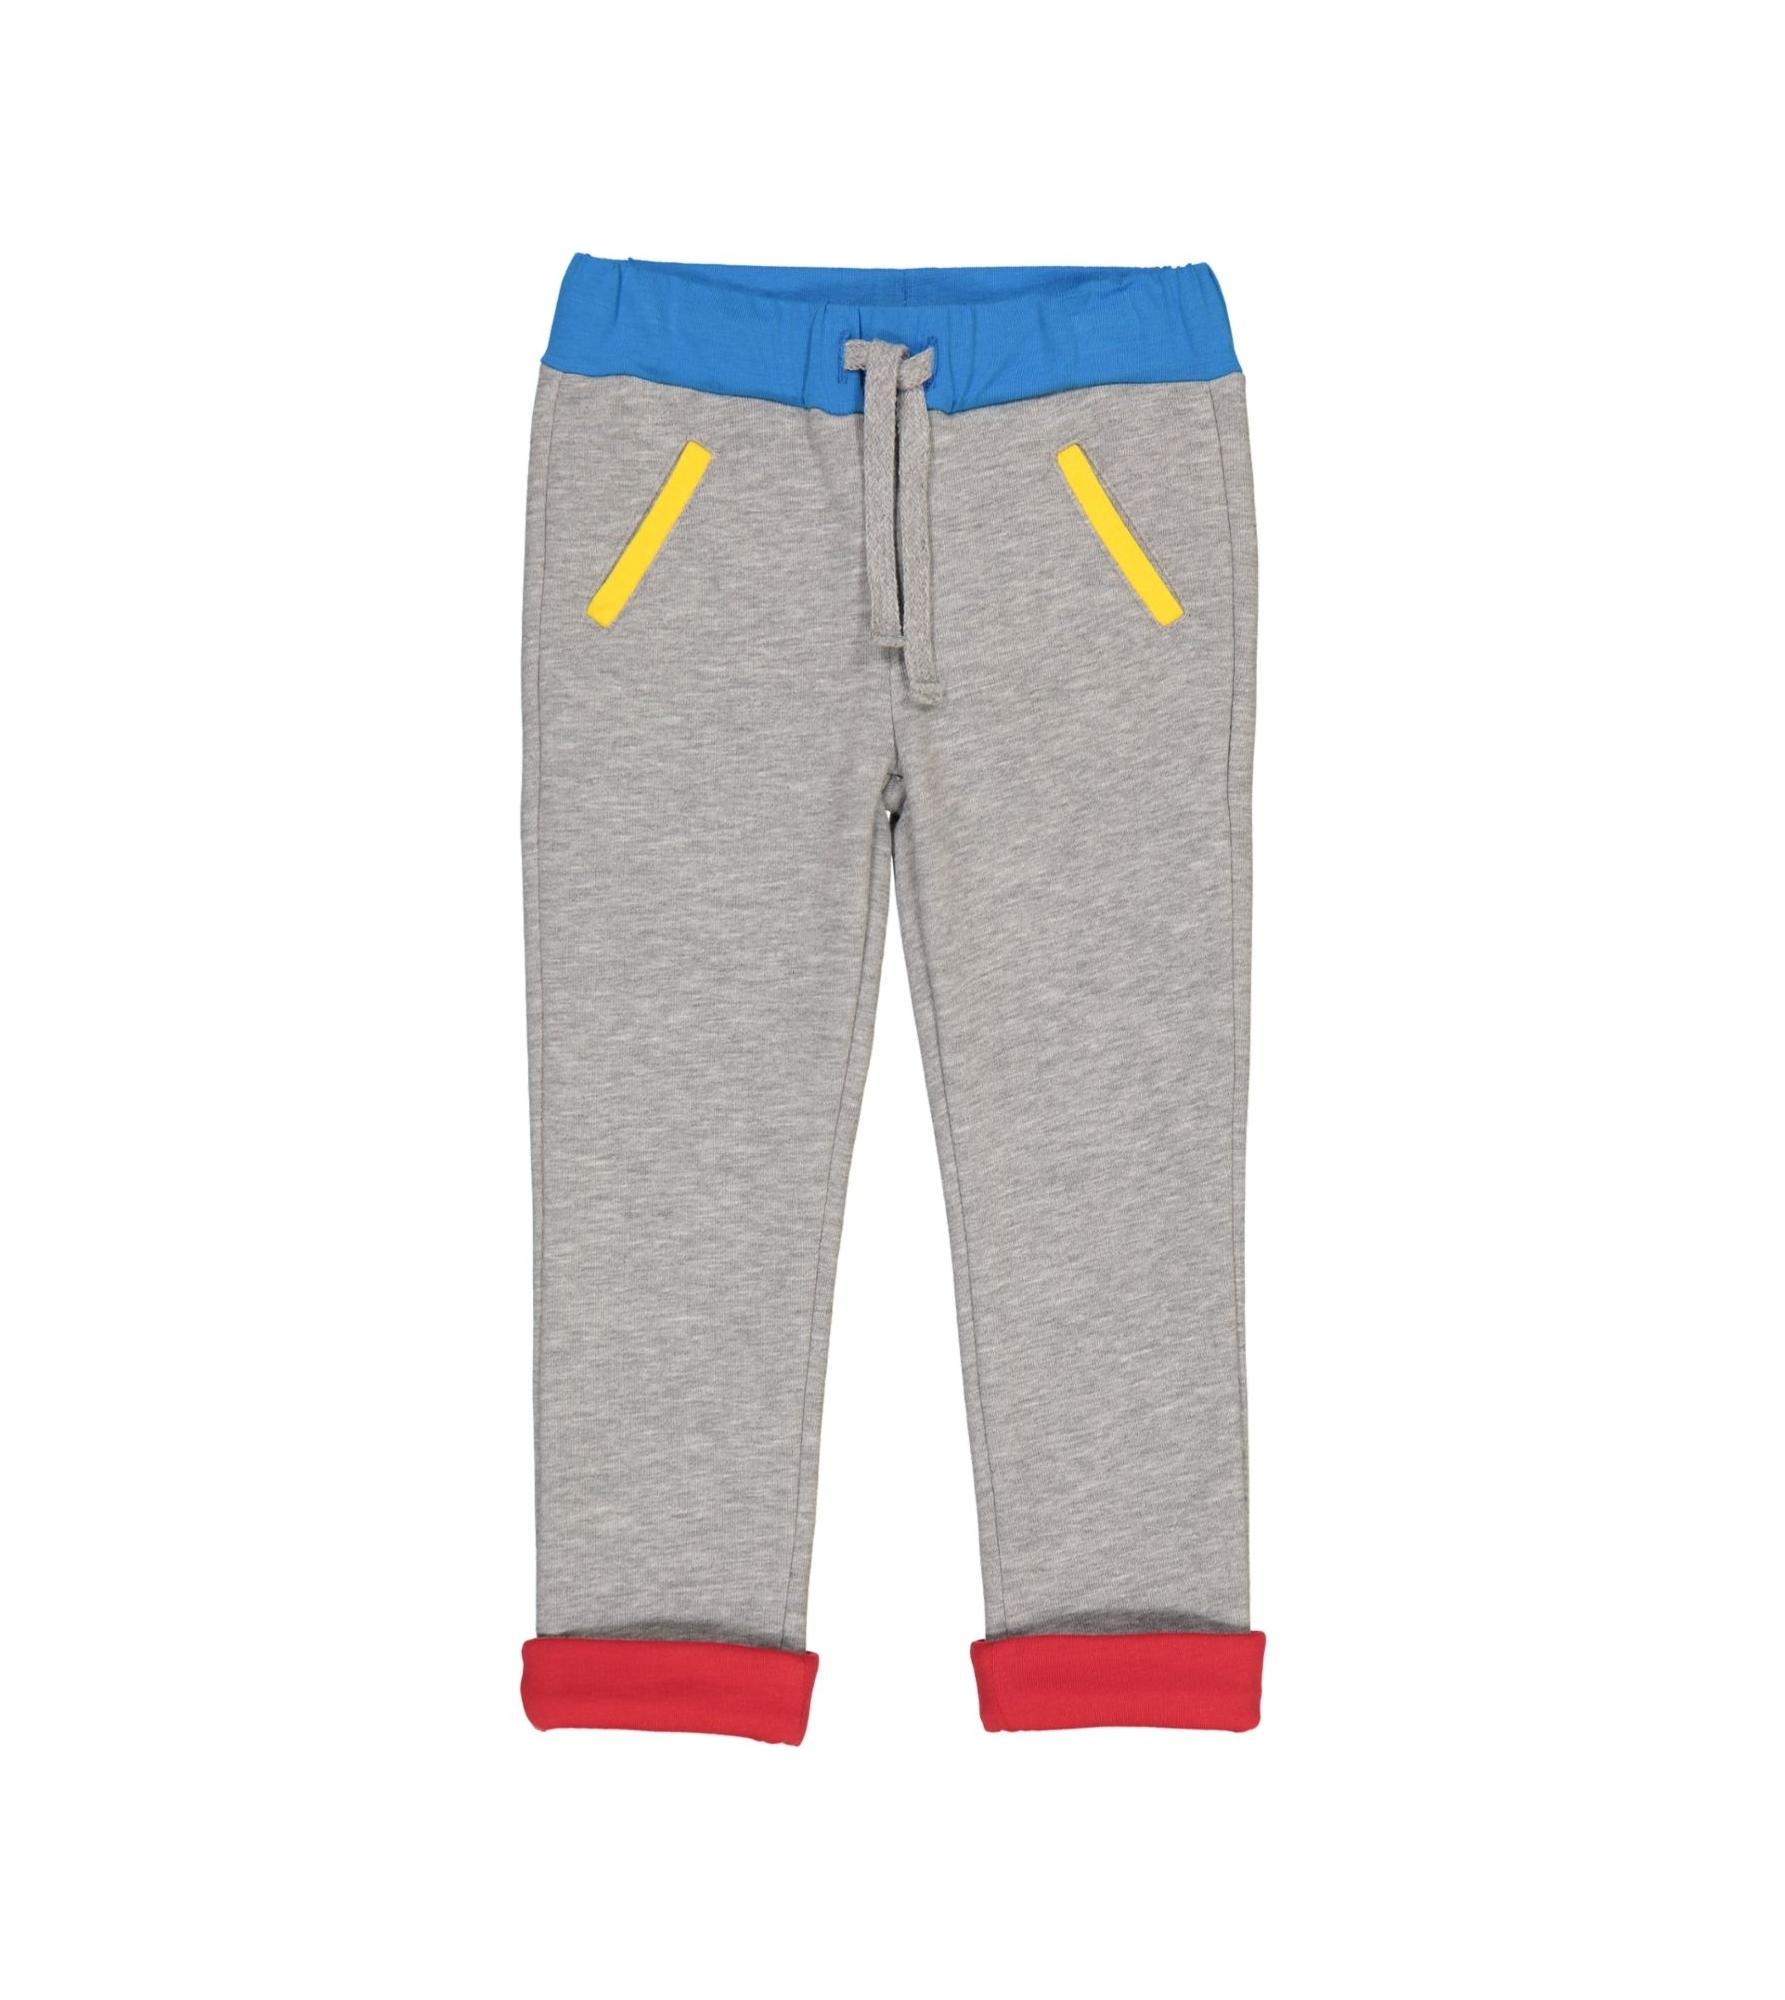 Malmo Slim Fit Sweatpants Light Heather Grey_downsized.jpg